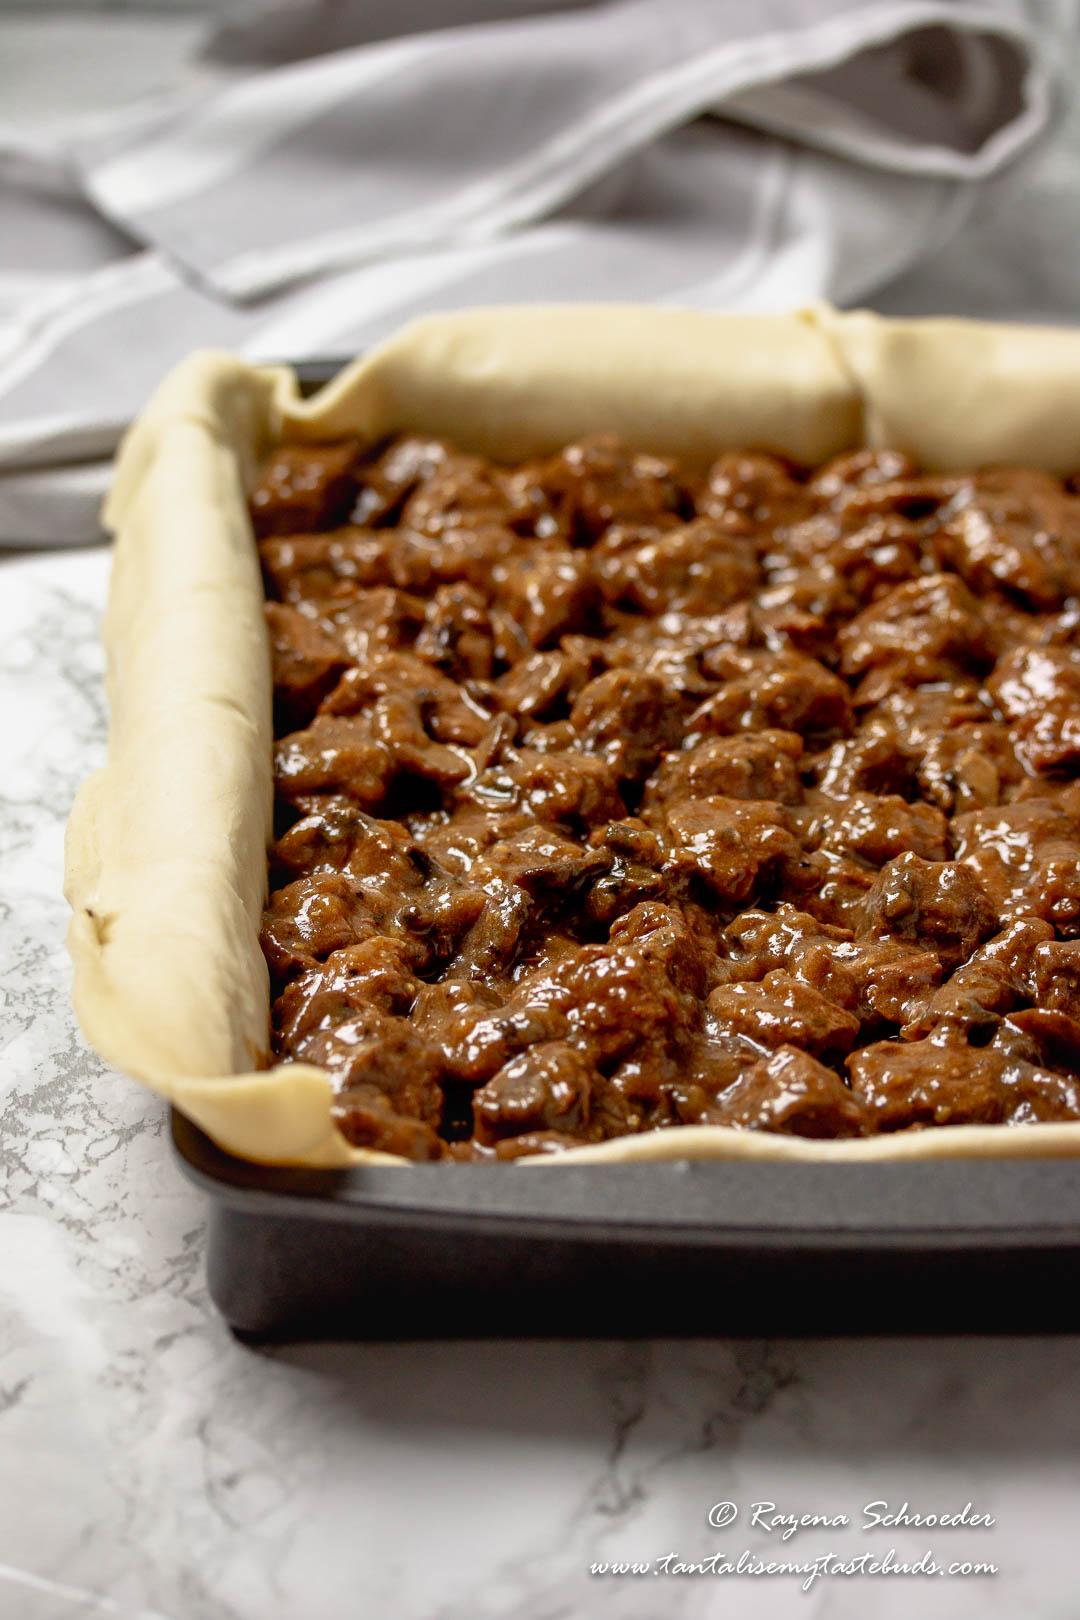 Quick Steak And Mushroom Pie - All Mushroom Info